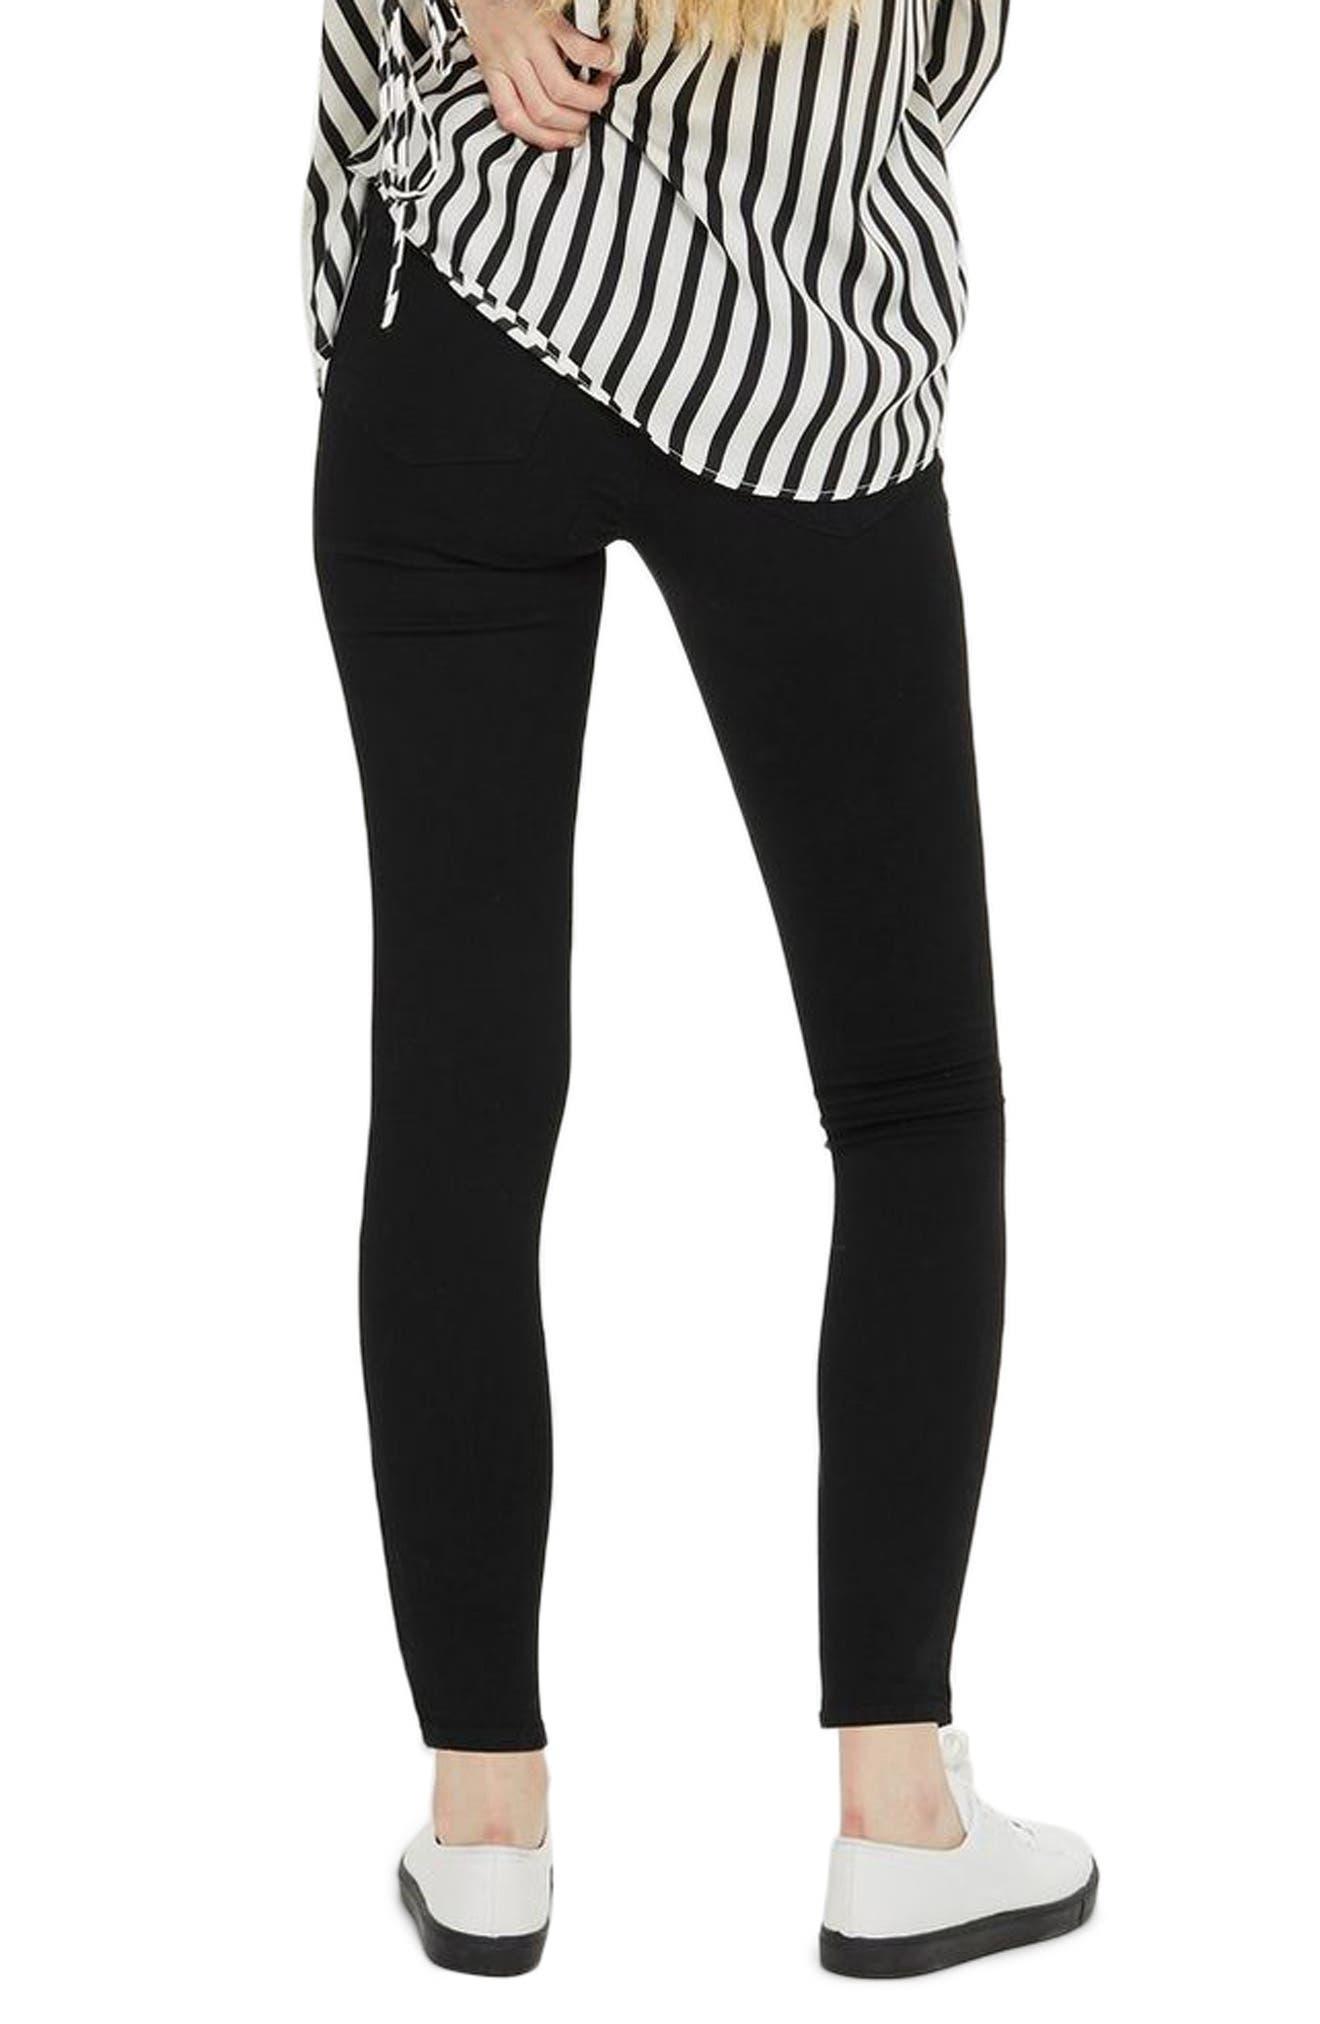 MOTO Leigh Super Rip Jeans,                             Alternate thumbnail 3, color,                             Black